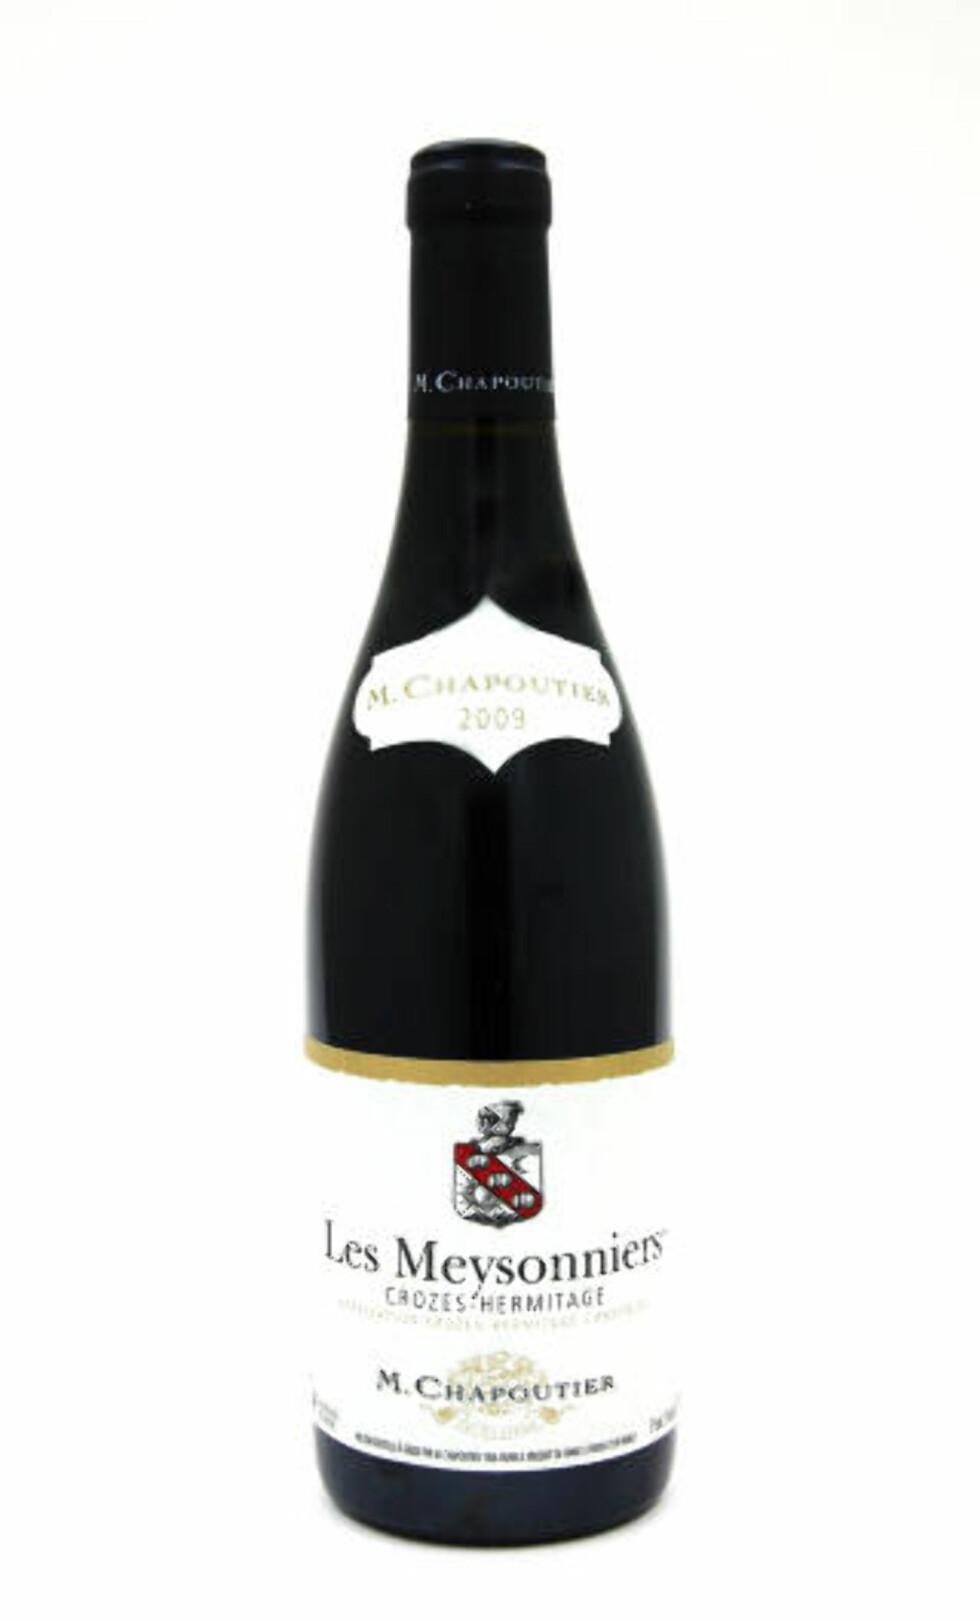 EN FRANSK SEKSER: Chapoutier Les Meysonniers 2009, Crozes-Hermitage er en god fransk vin fra Rhônedalen.